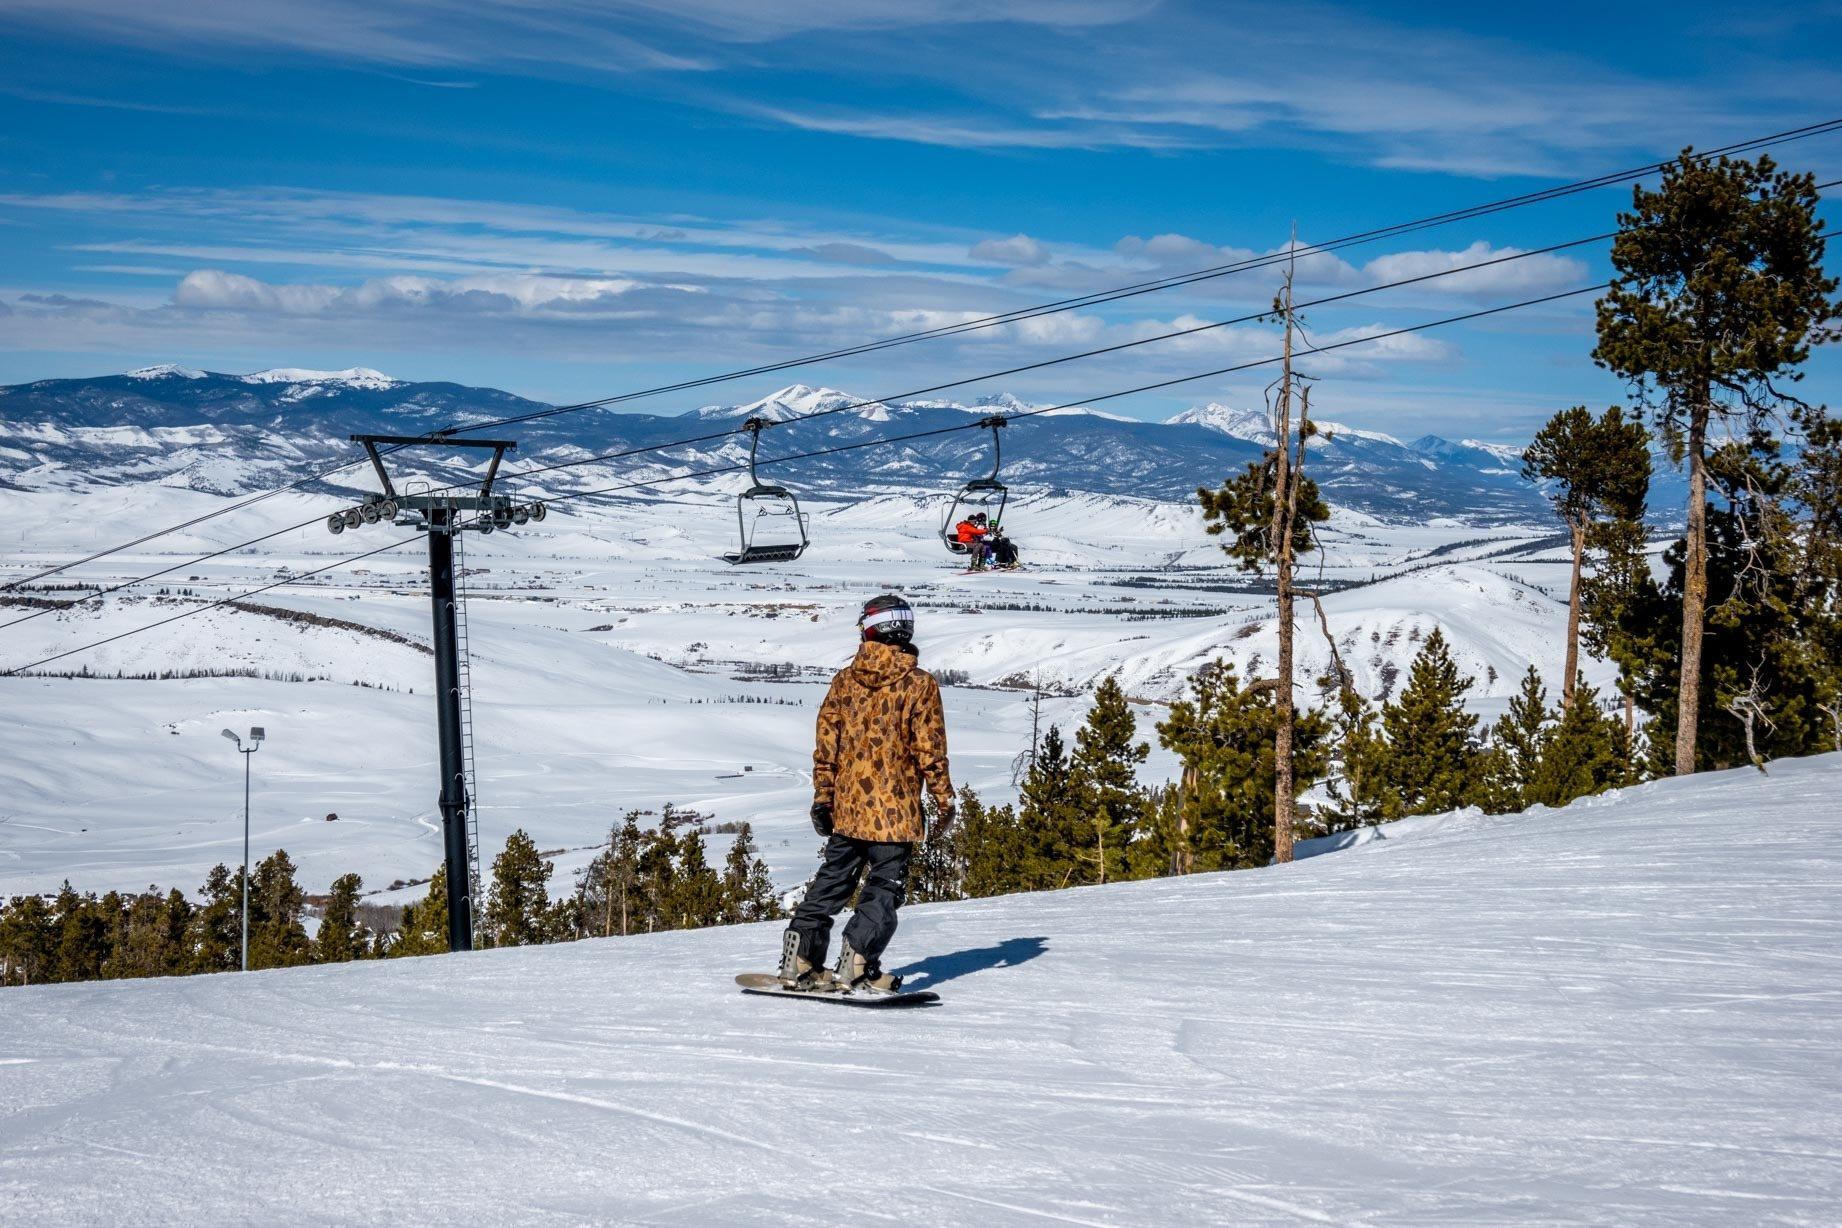 Snowboarder at Granby Mountain Ranch near ski lift